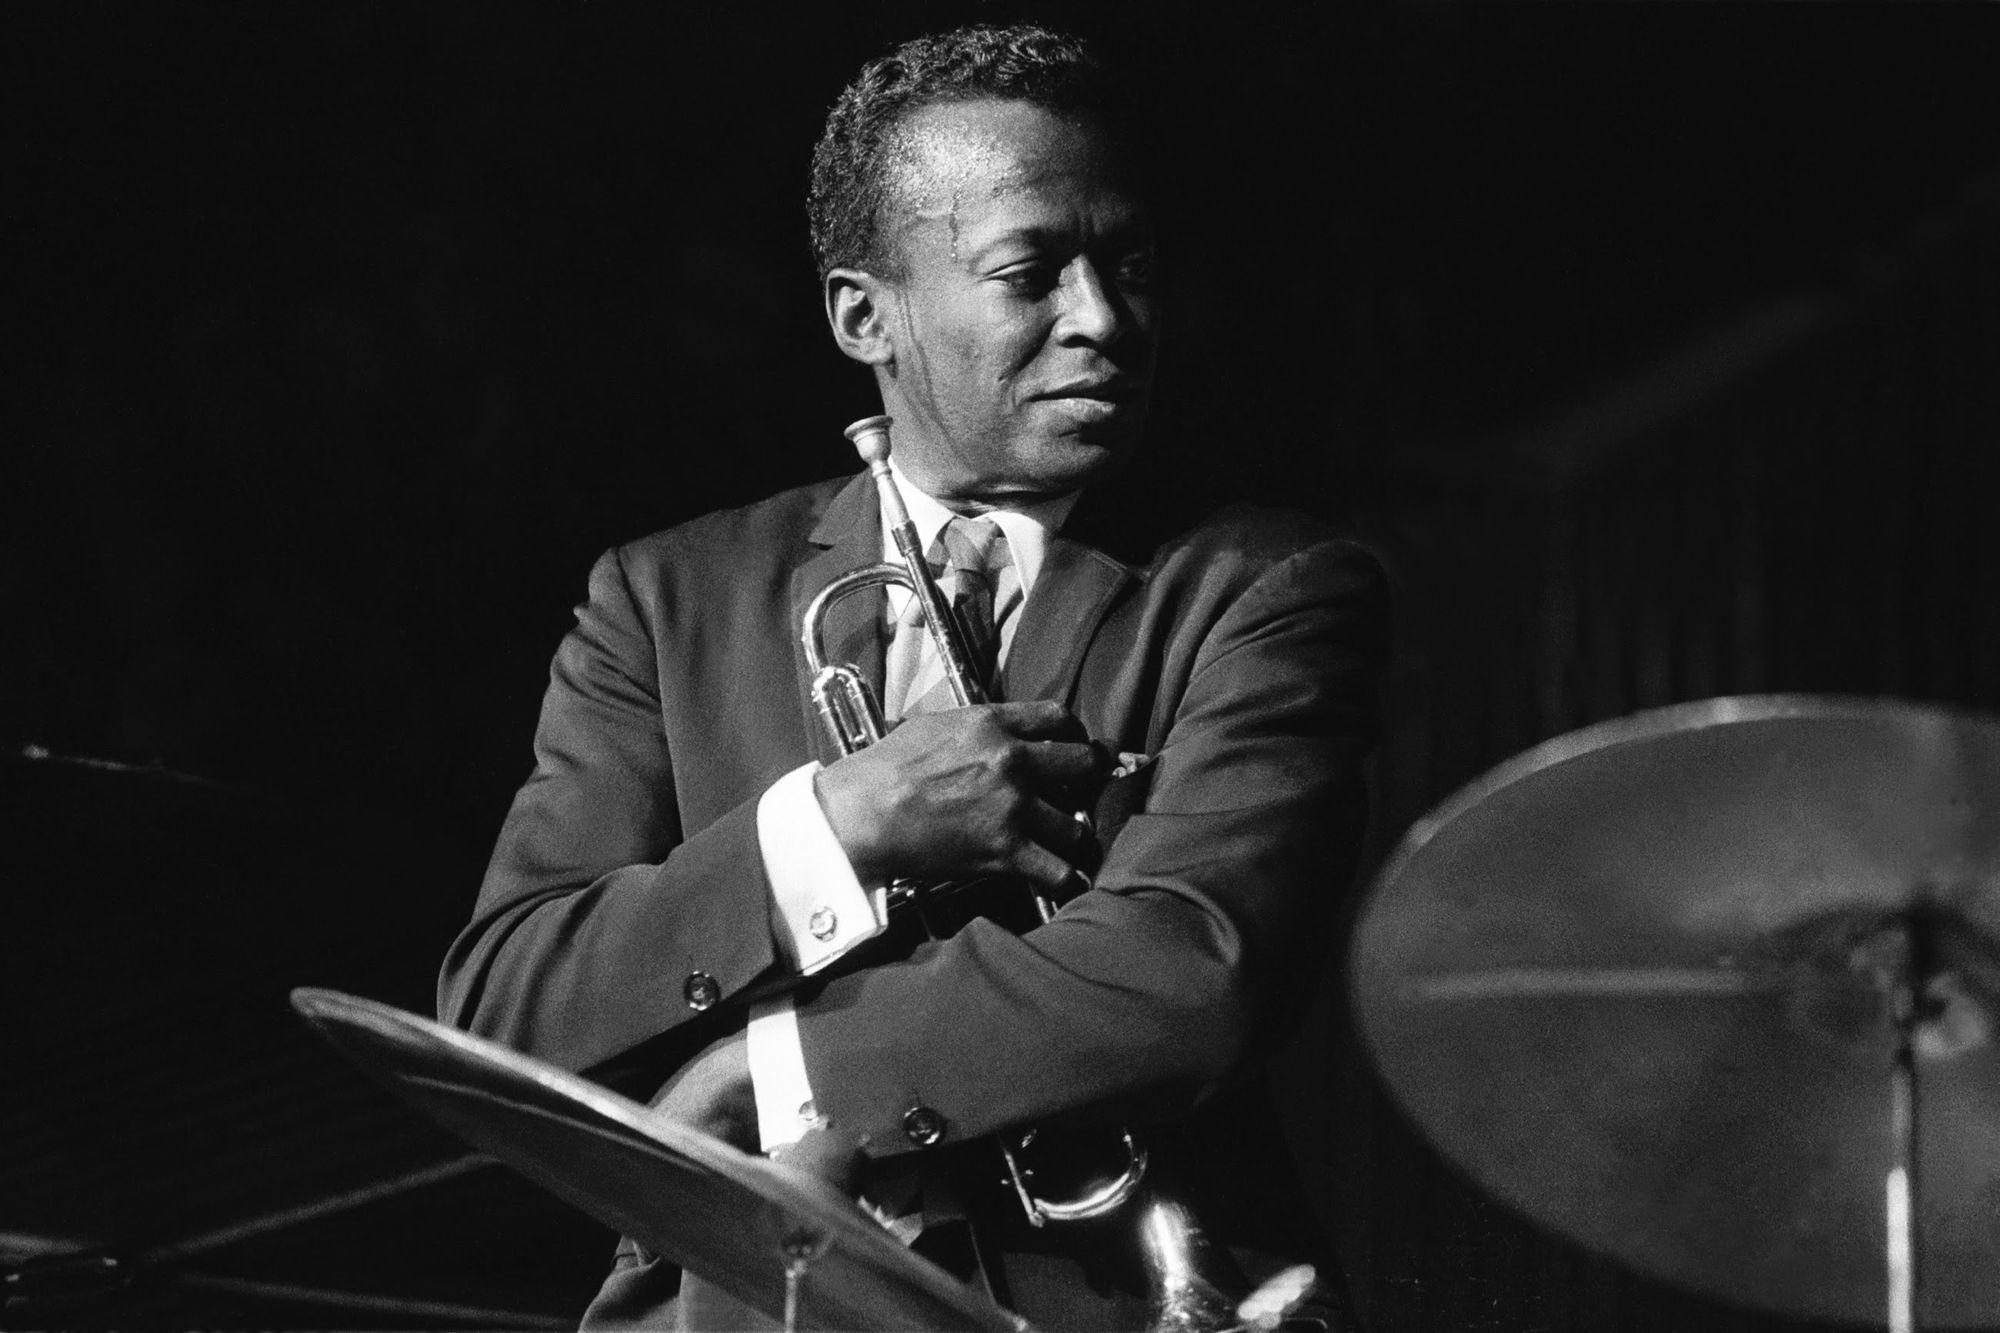 #listeningto A Kind of Blue: Miles Davis